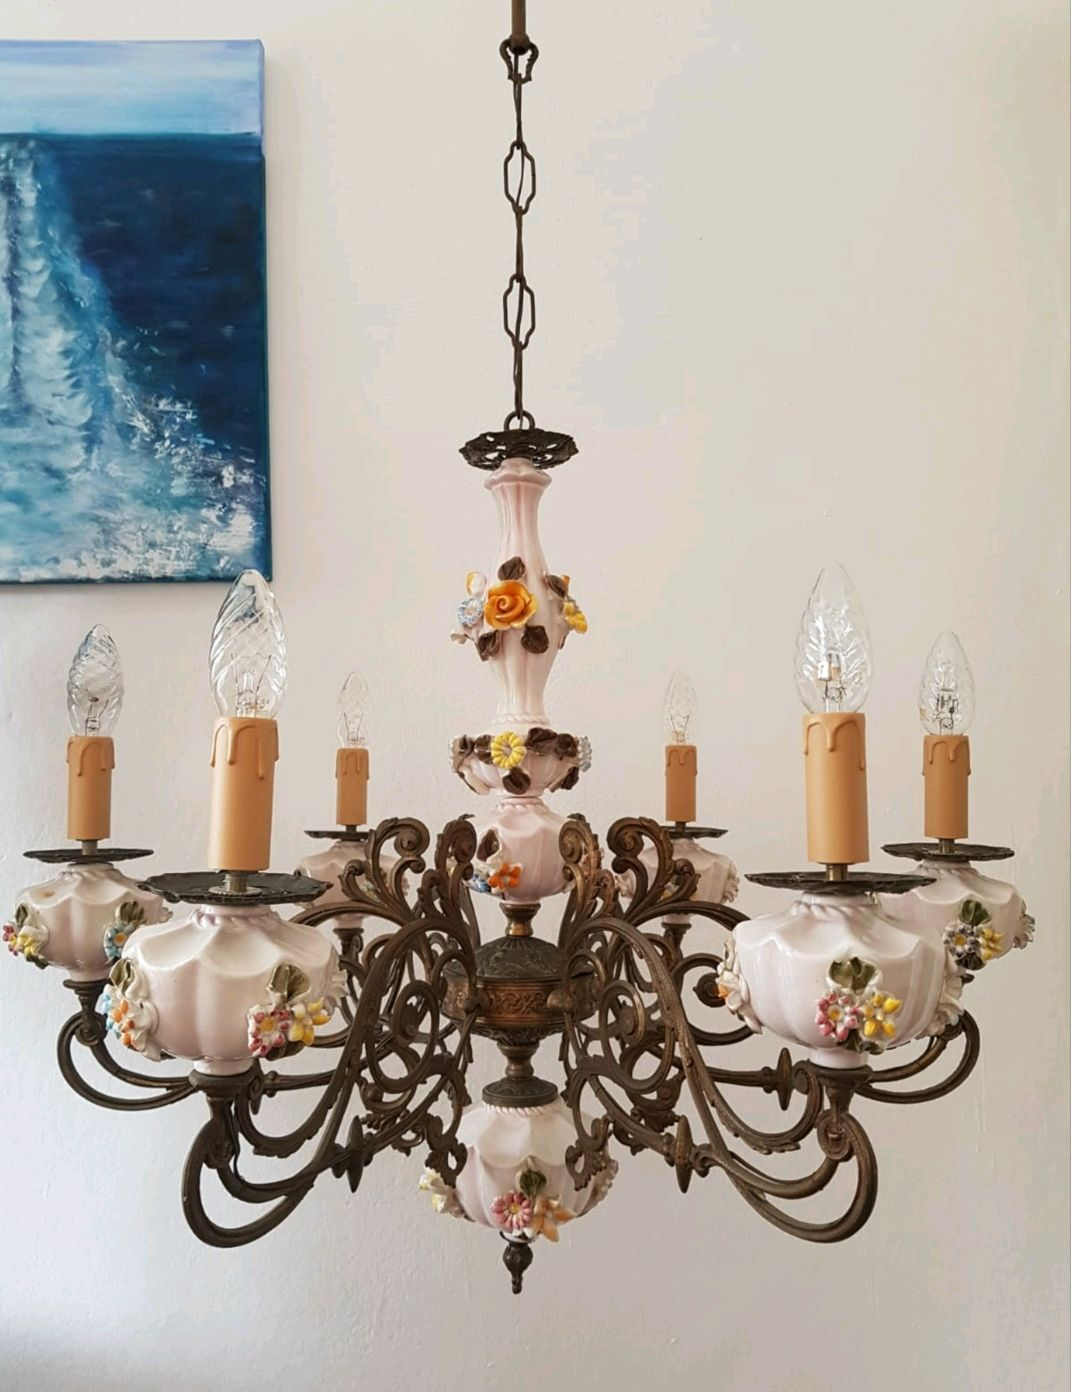 Antique brass chandelier with ceramic elements. Italy, Vintage interior, Pisa,  Фото №1